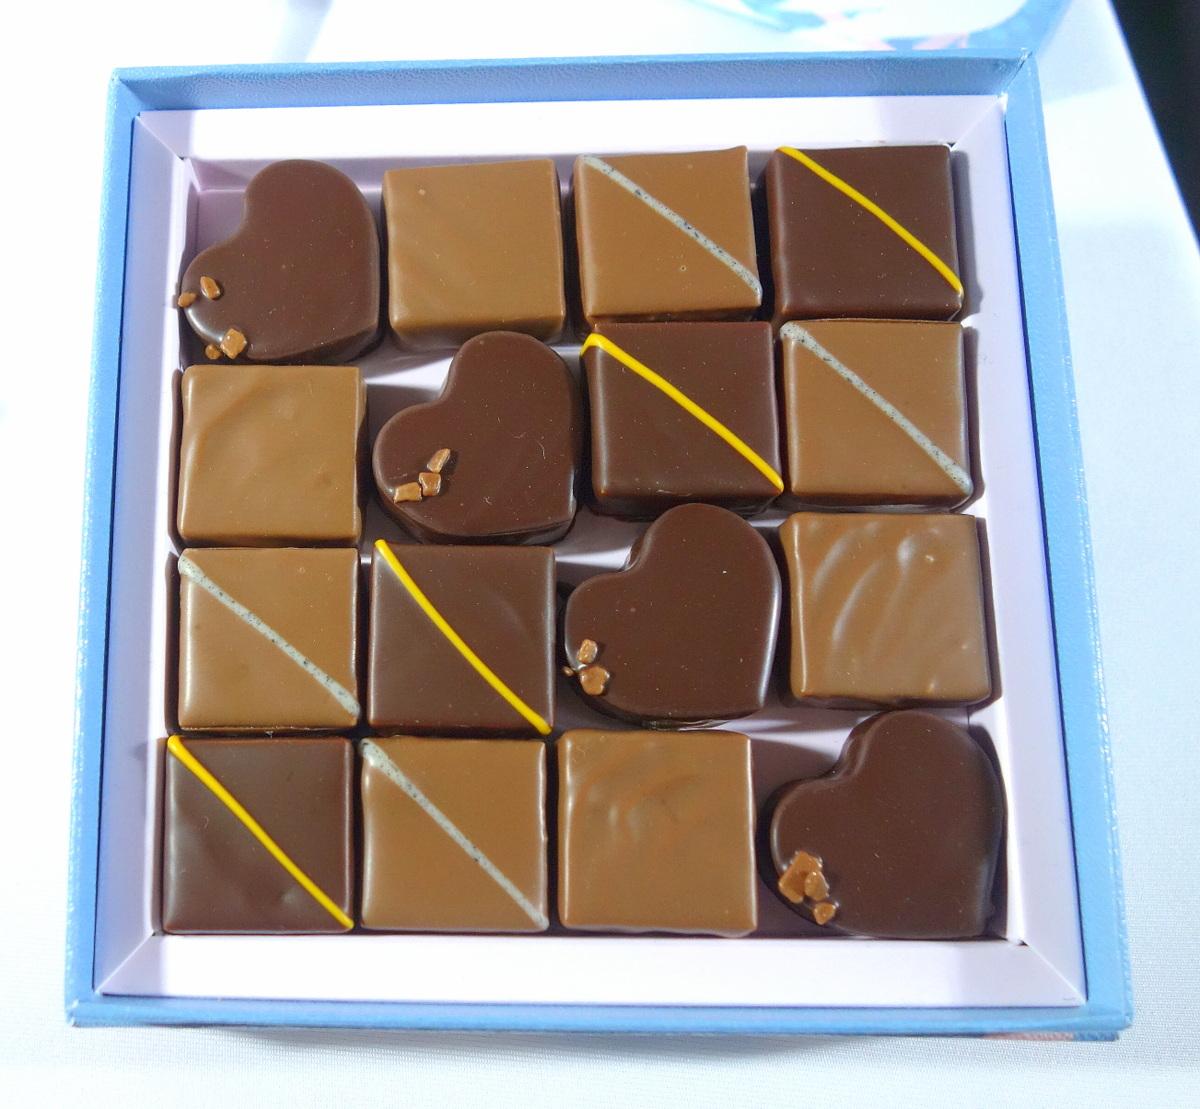 Maison du chocolat - Saint-Valentin 2019